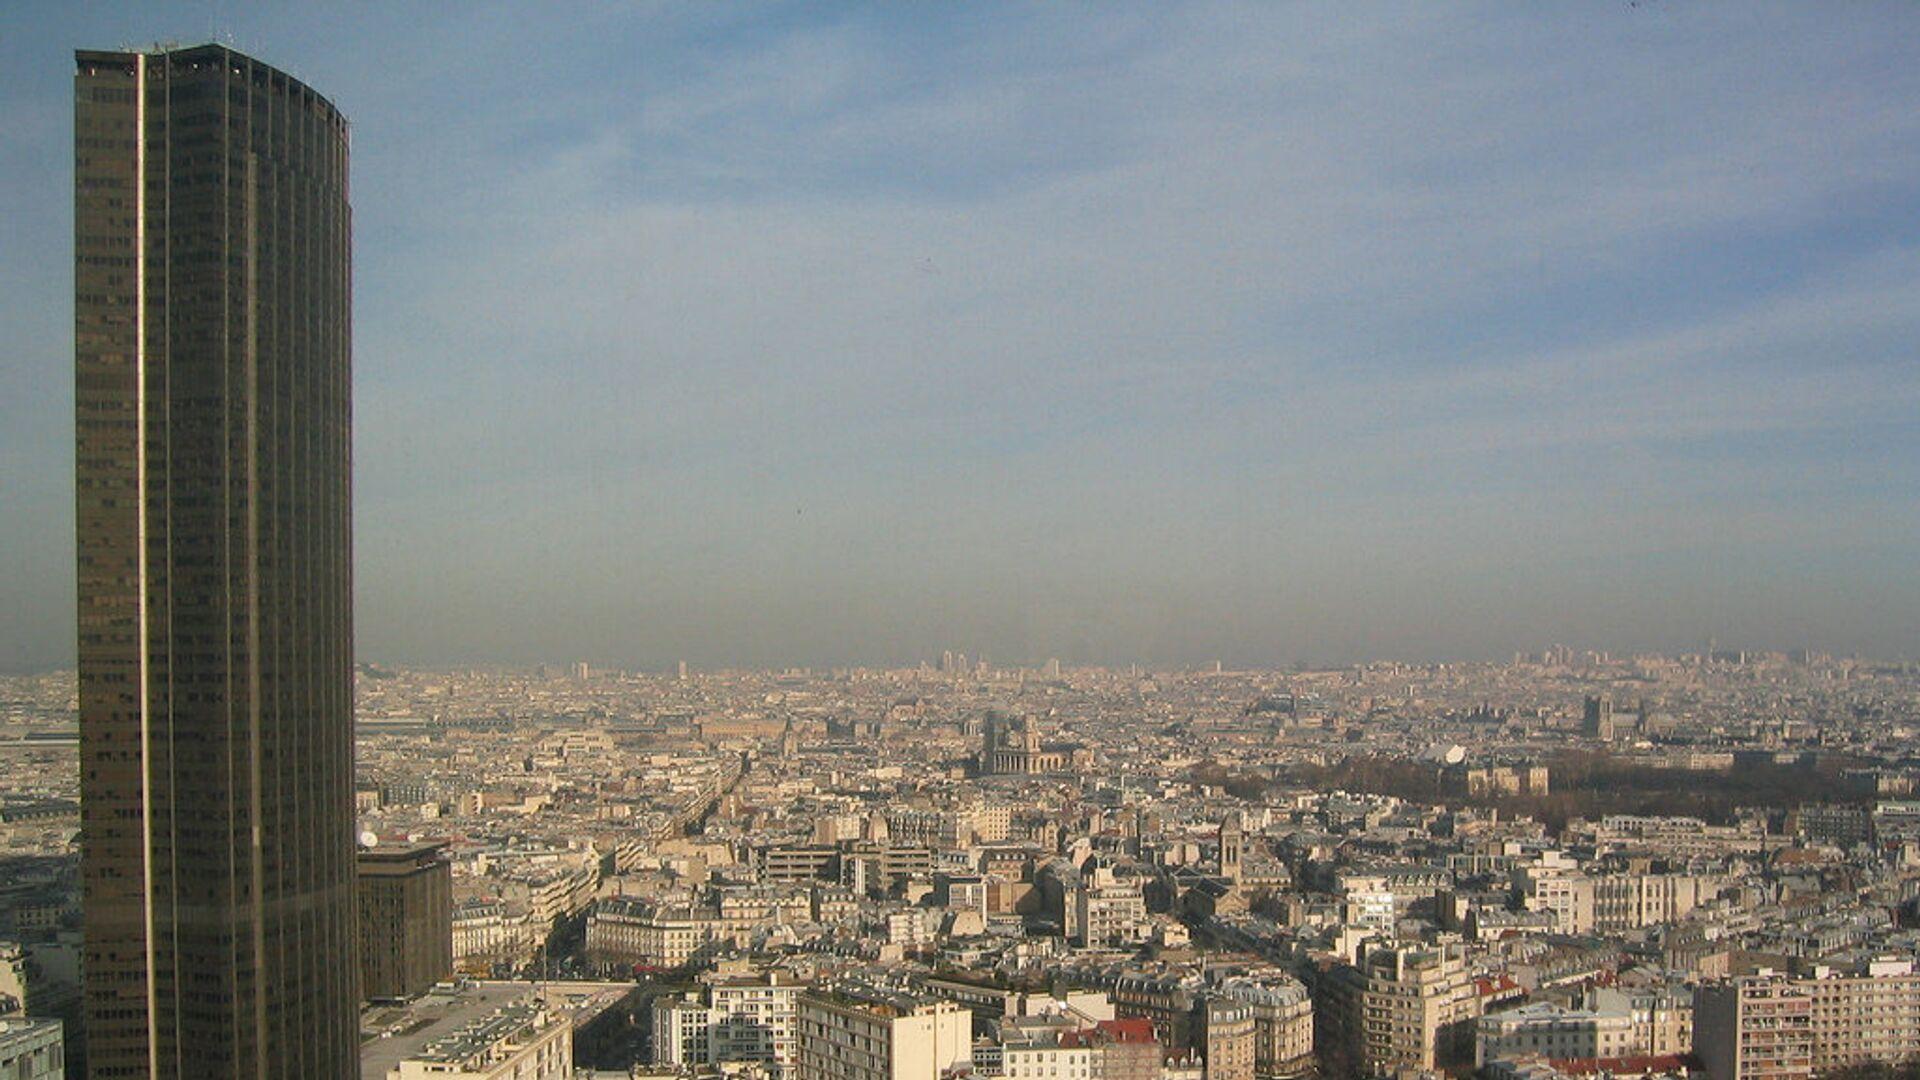 Башня Монпарнас в Париже - РИА Новости, 1920, 19.09.2020